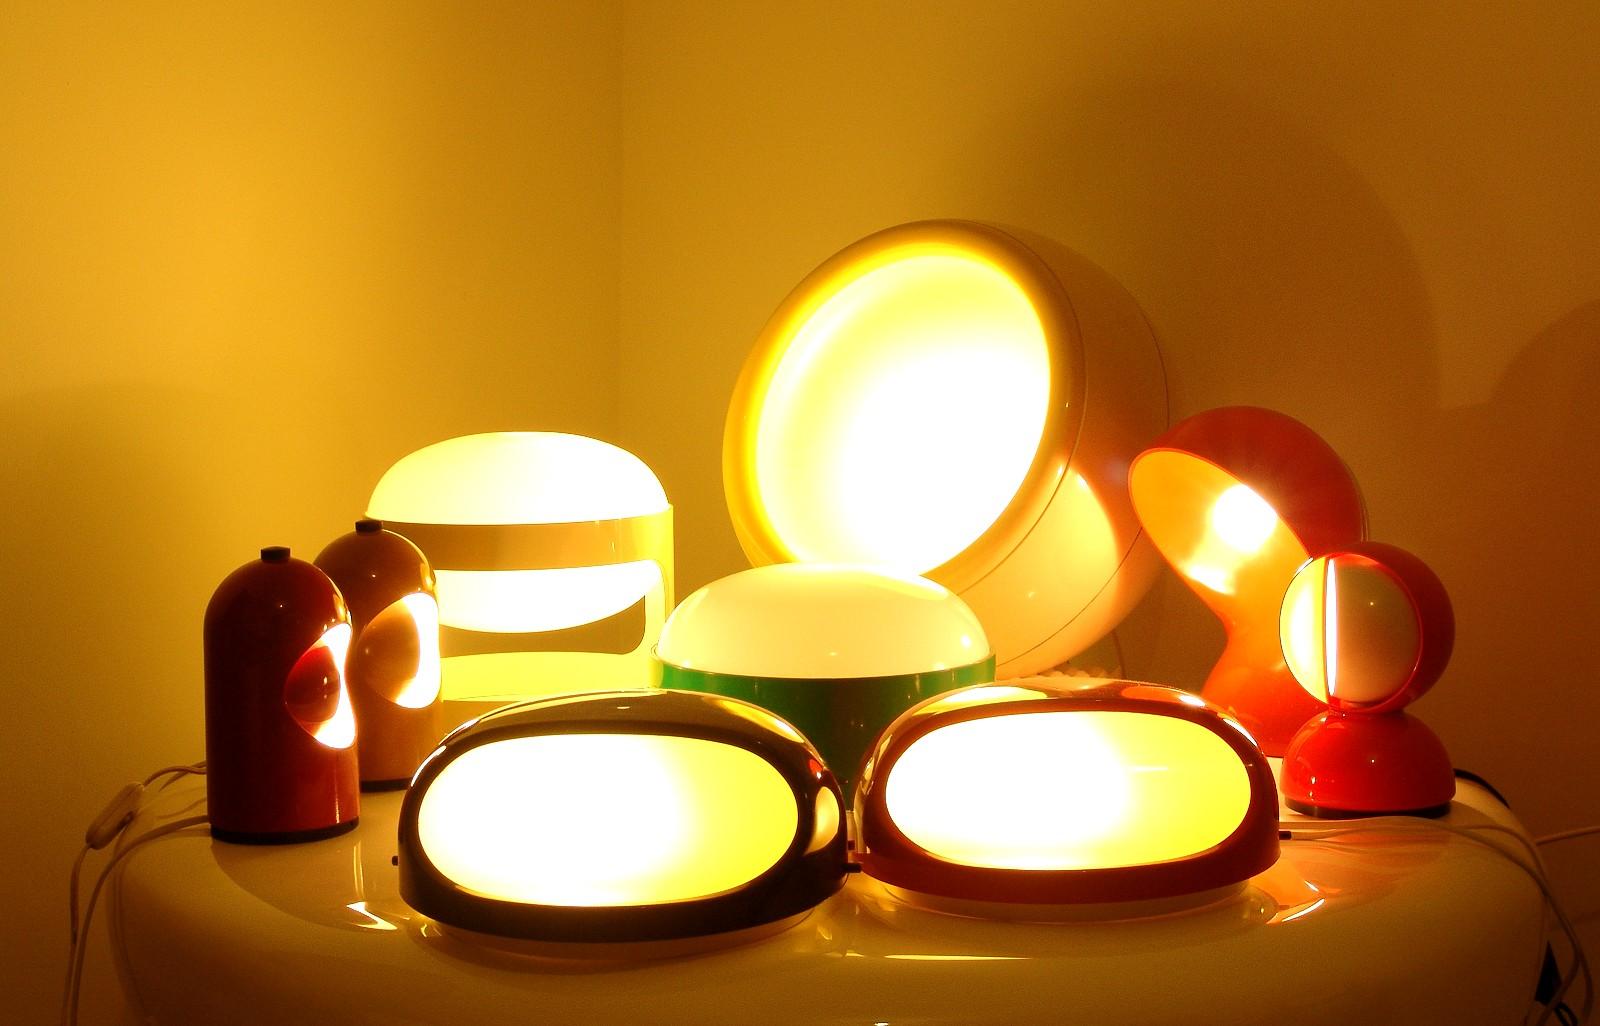 modern interior design design by kartell - clockwise from left red  yellow lightolier interplay  lamp (usa) in white kartell kd (kd) lamp design by joe colombo in